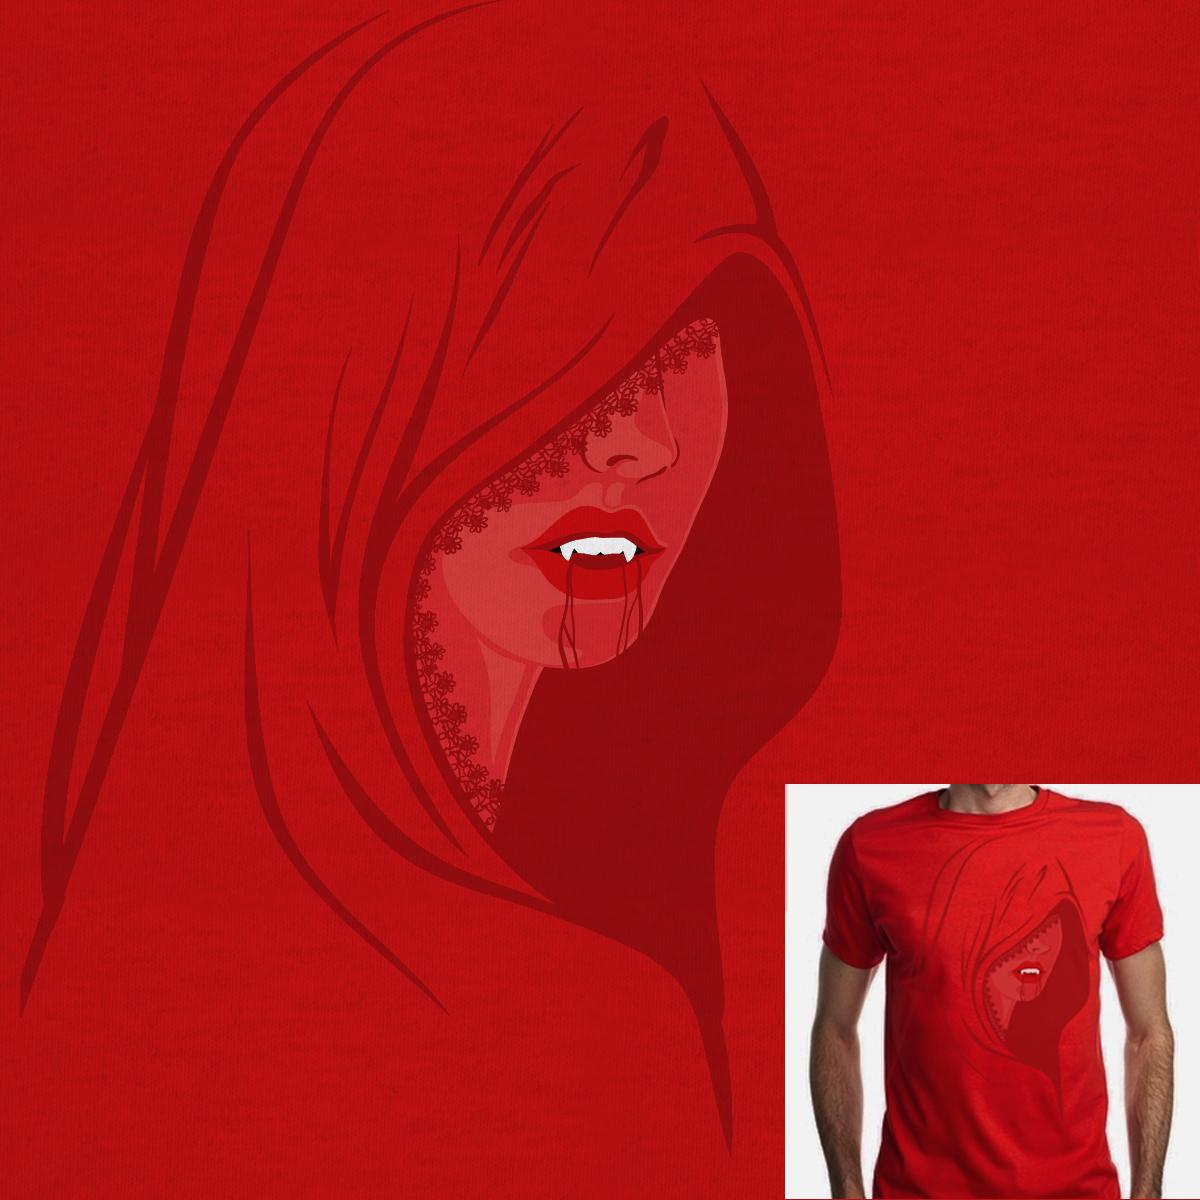 bloody red by badnobe on Threadless